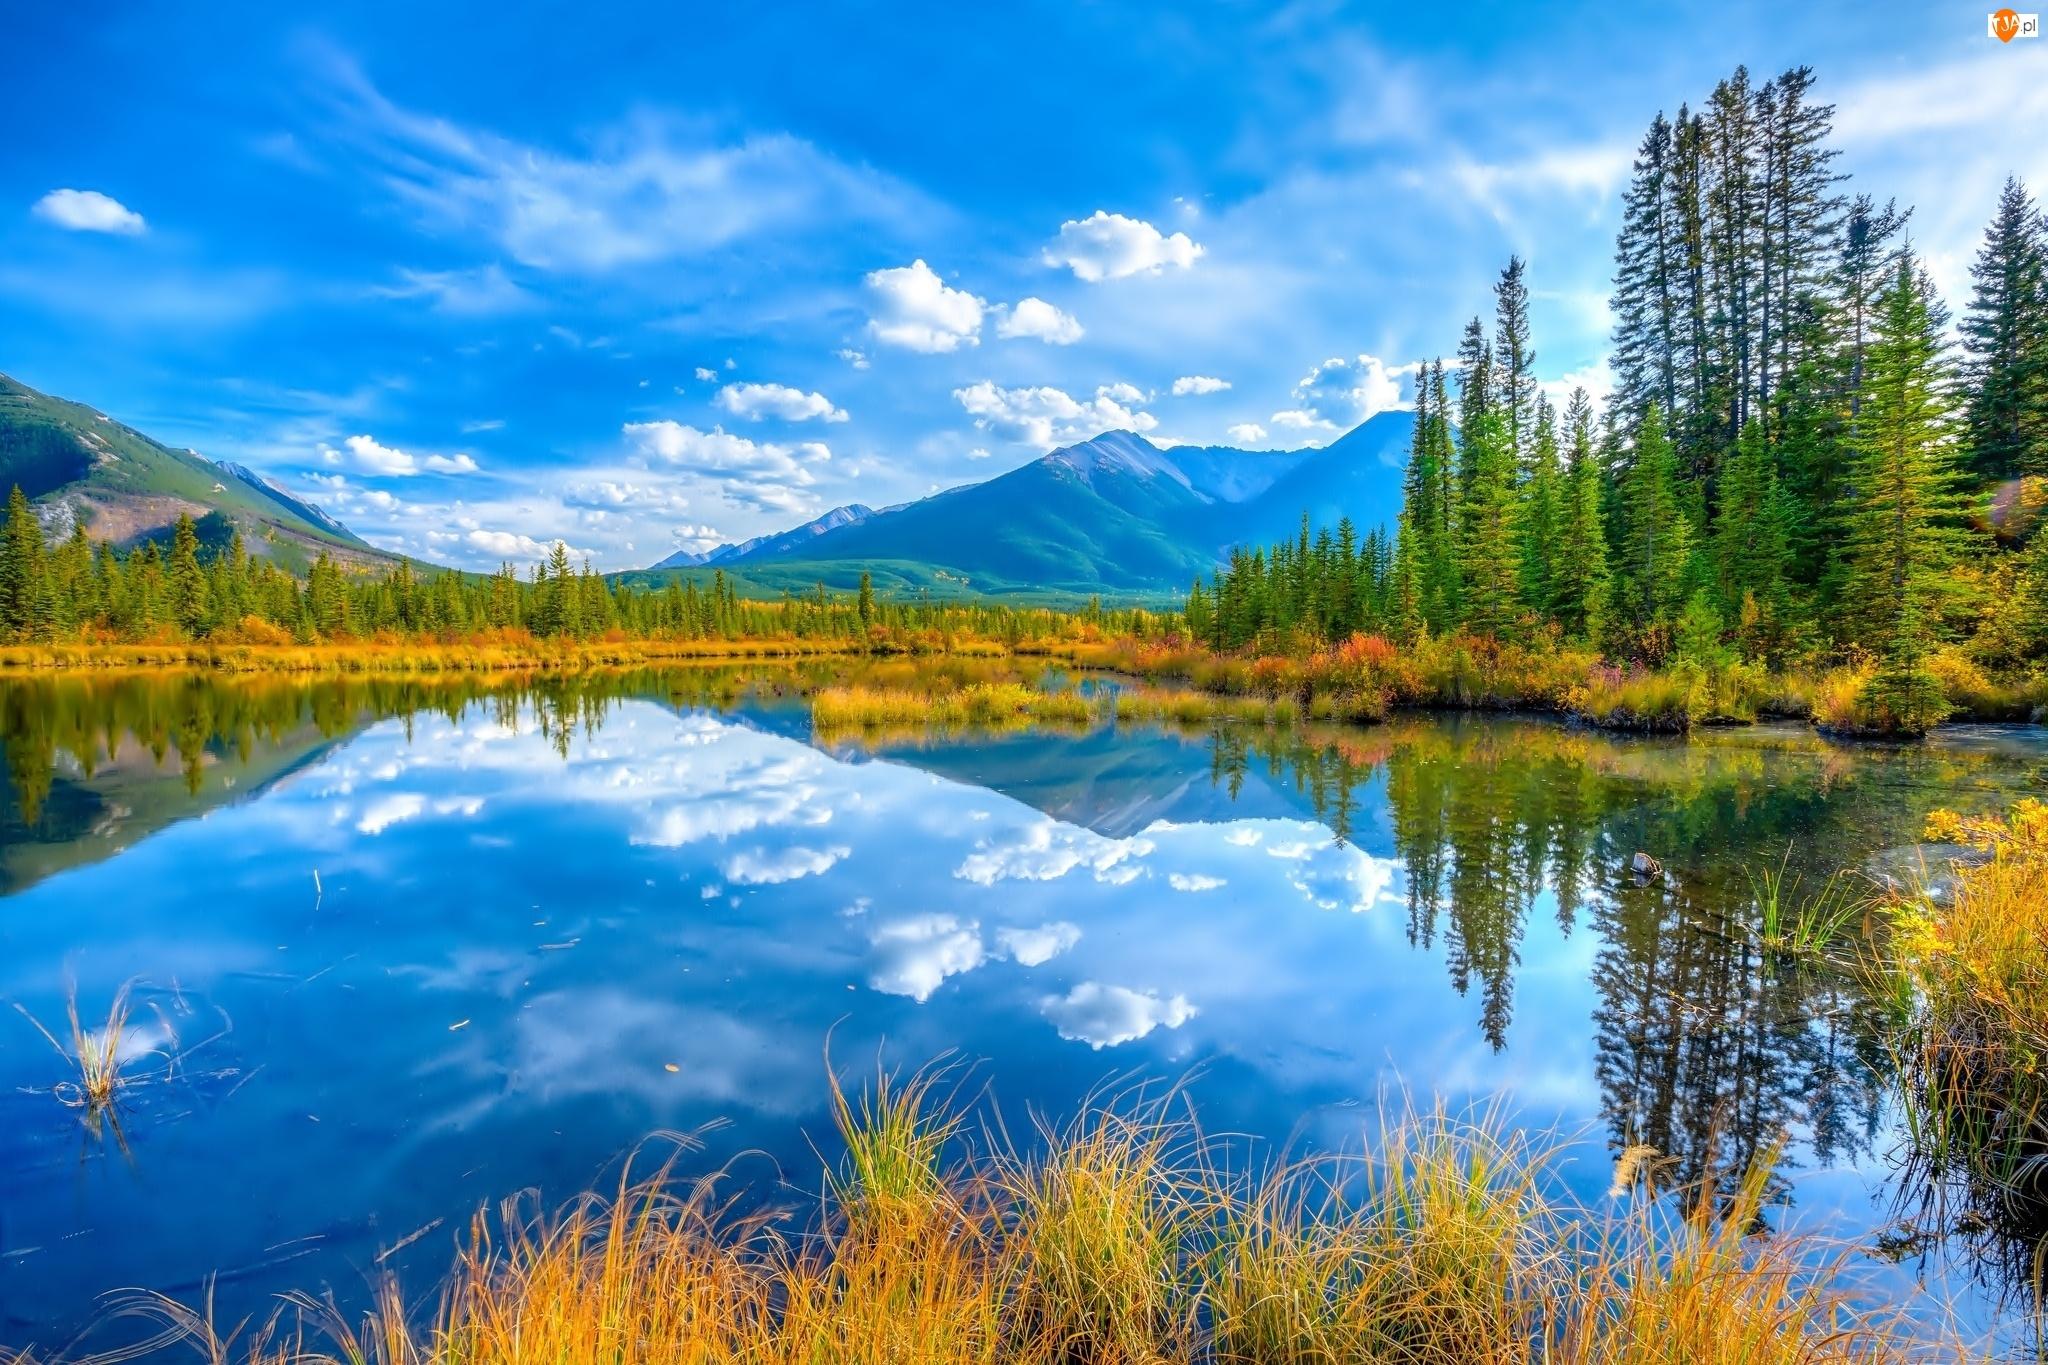 kanada, Góry, Las, Jezioro, Banff